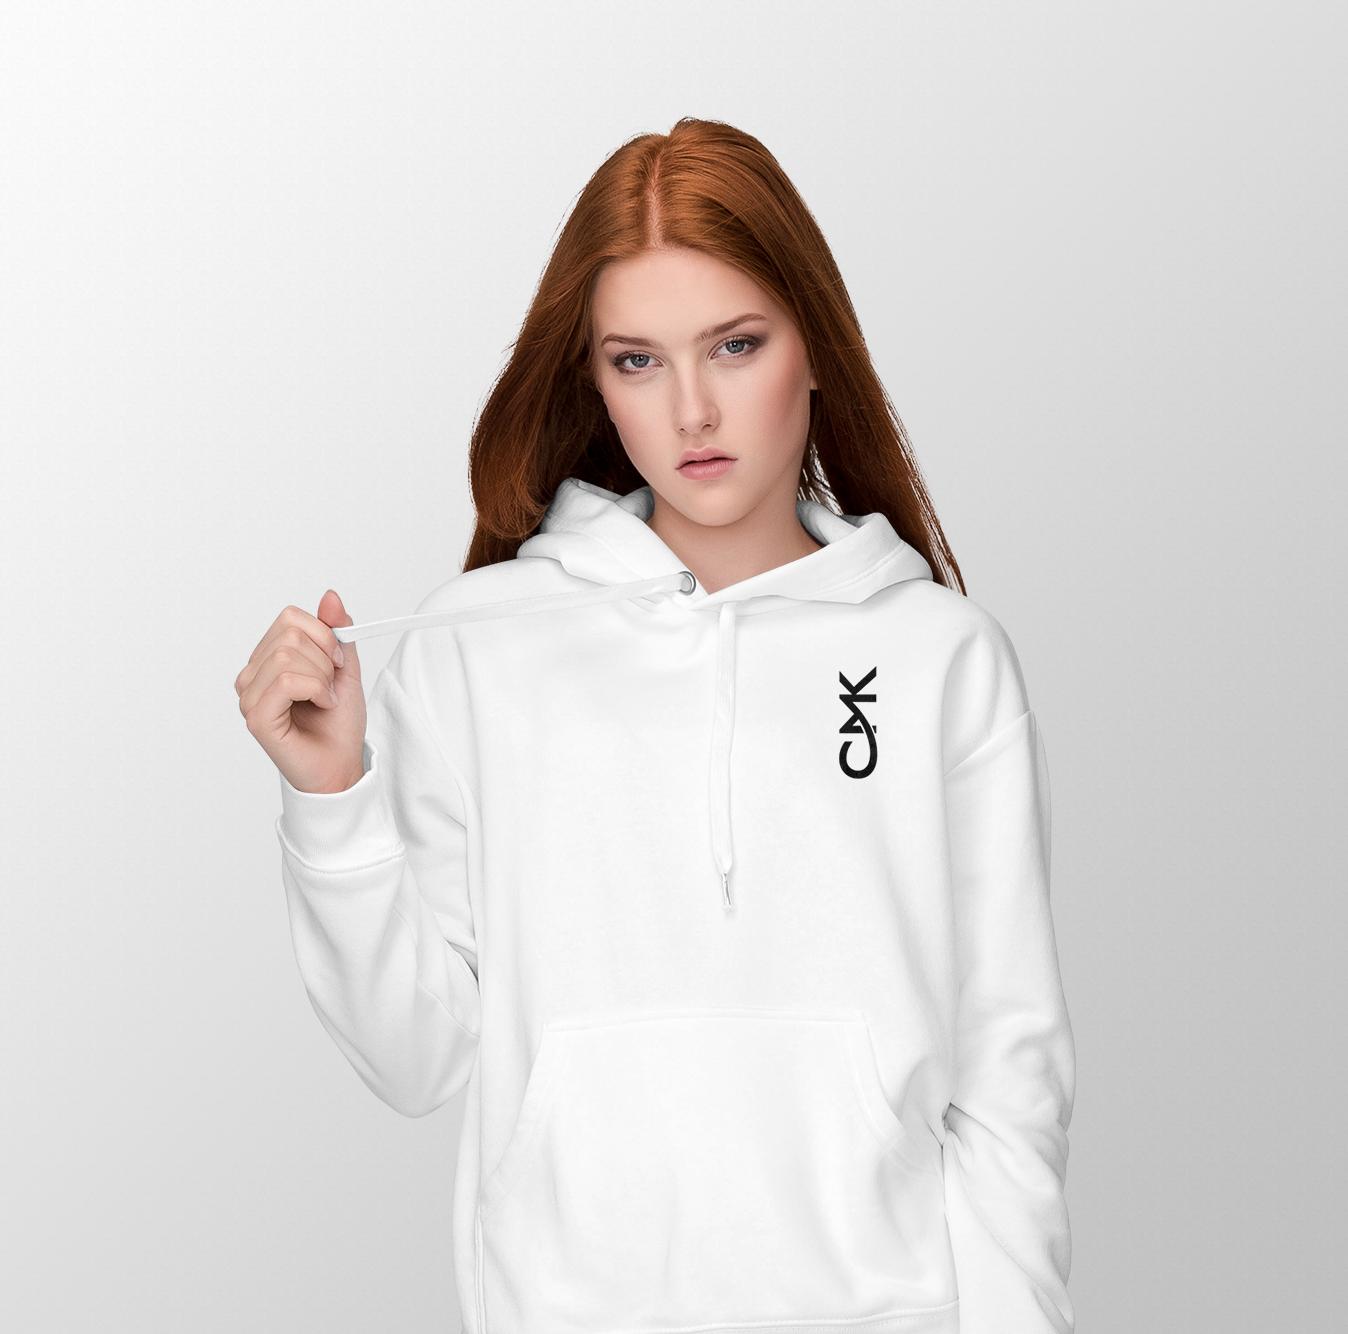 hoodie-female-front5